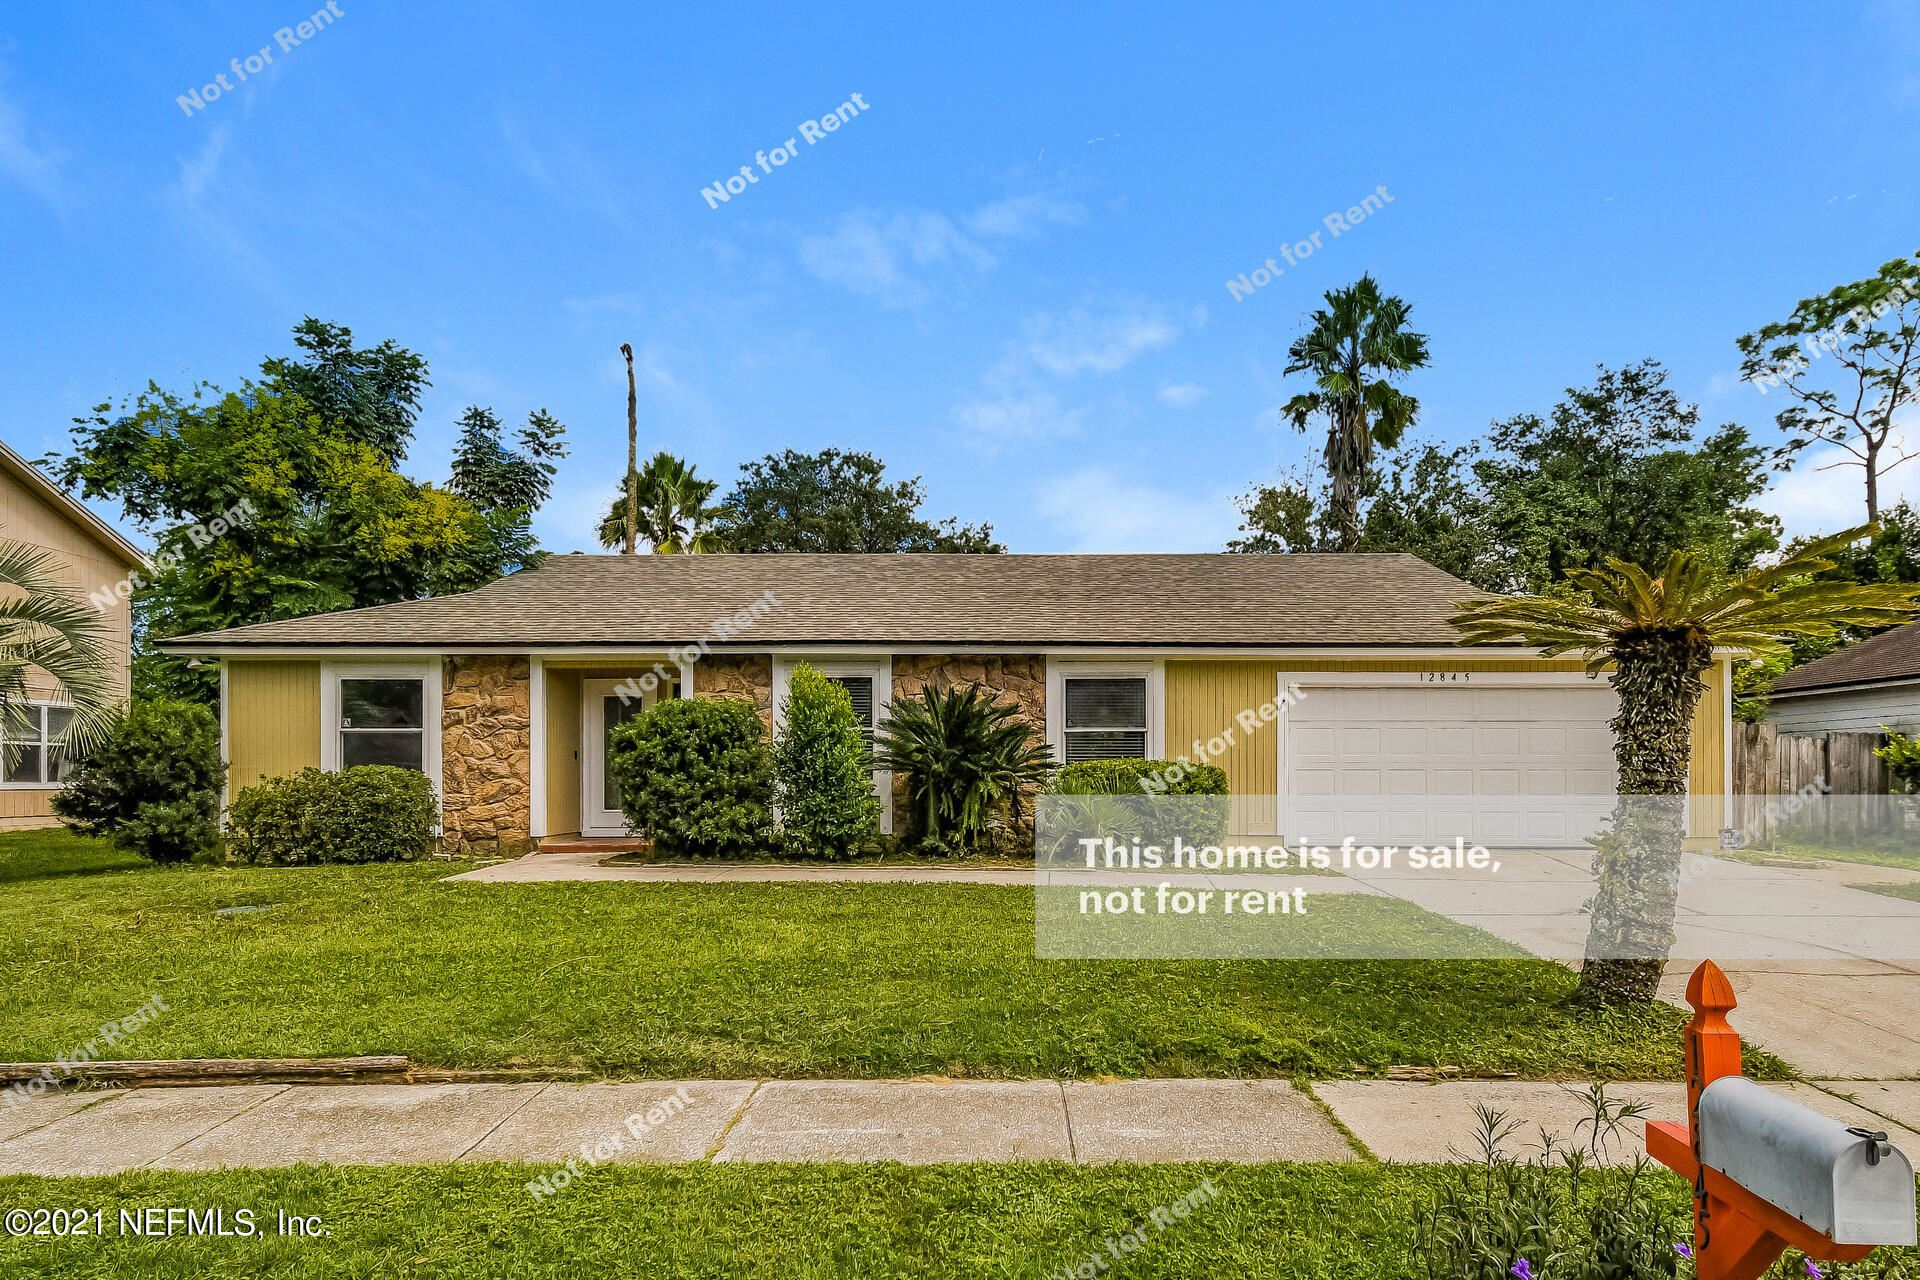 12845 JULINGTON RIDGE DR E #Unit No: 3 Lot No: 6, Jacksonville, FL 32258 - MLS#: 1133668